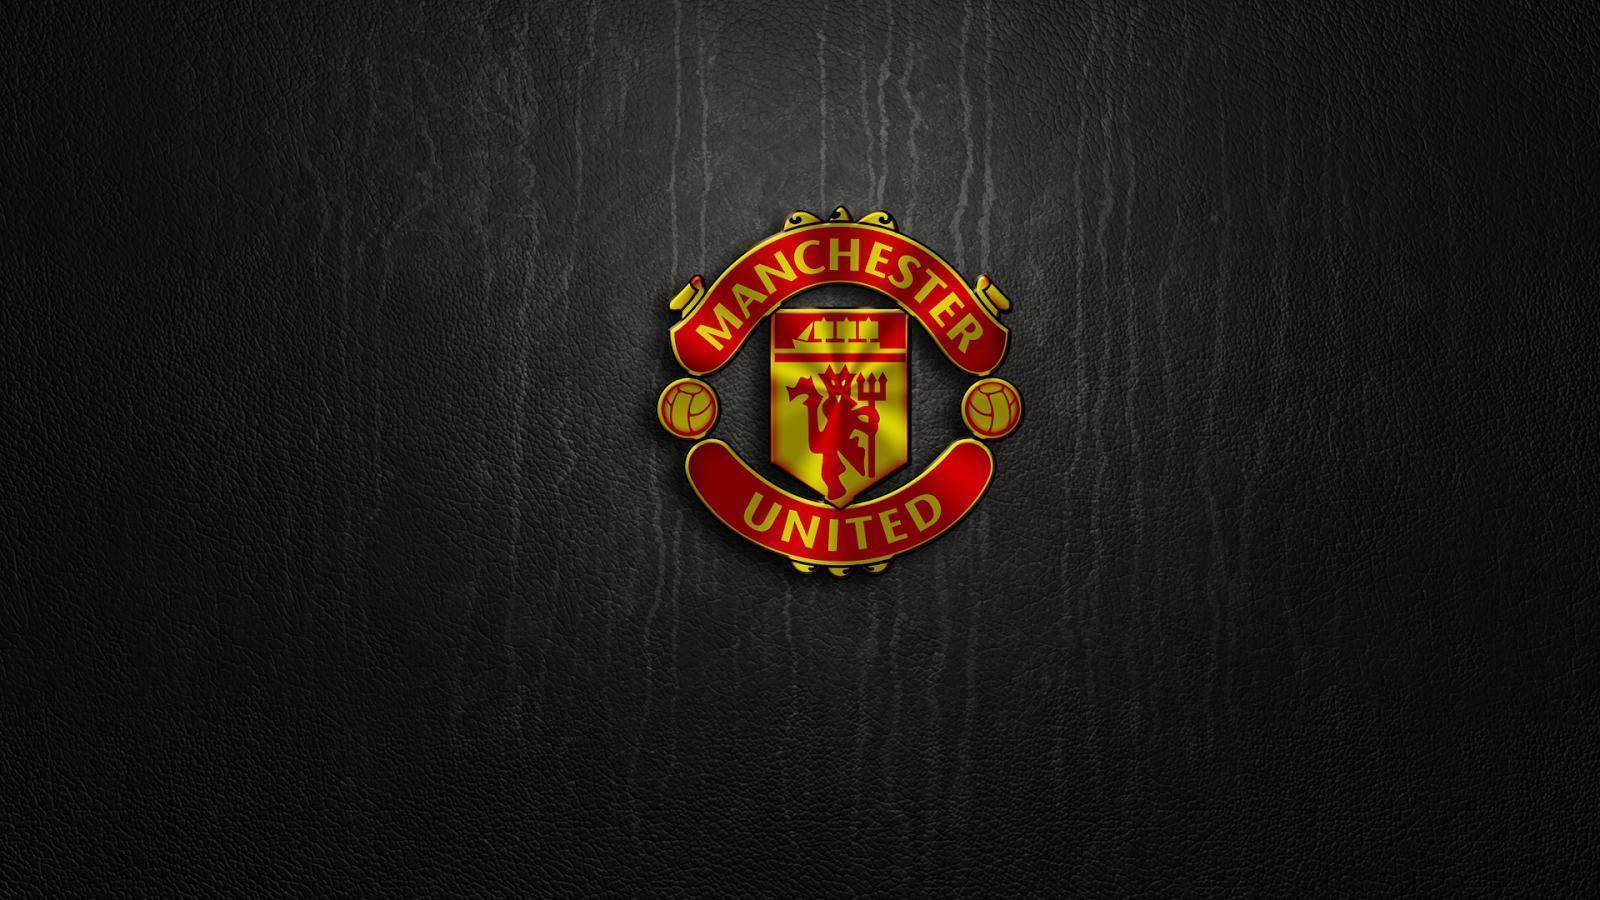 Manchester United Football Club Wallpaper | Football Wallpaper HD